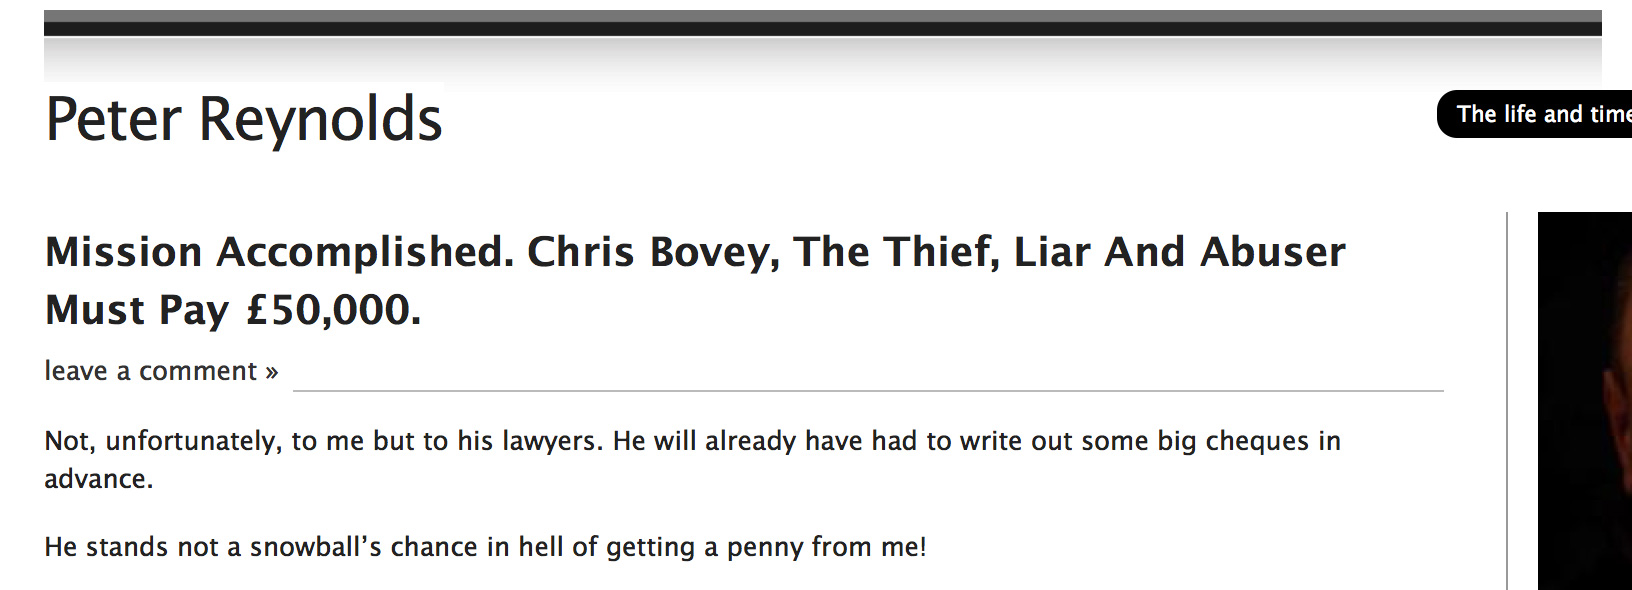 Defamatory screenshot from Reynolds' blog.